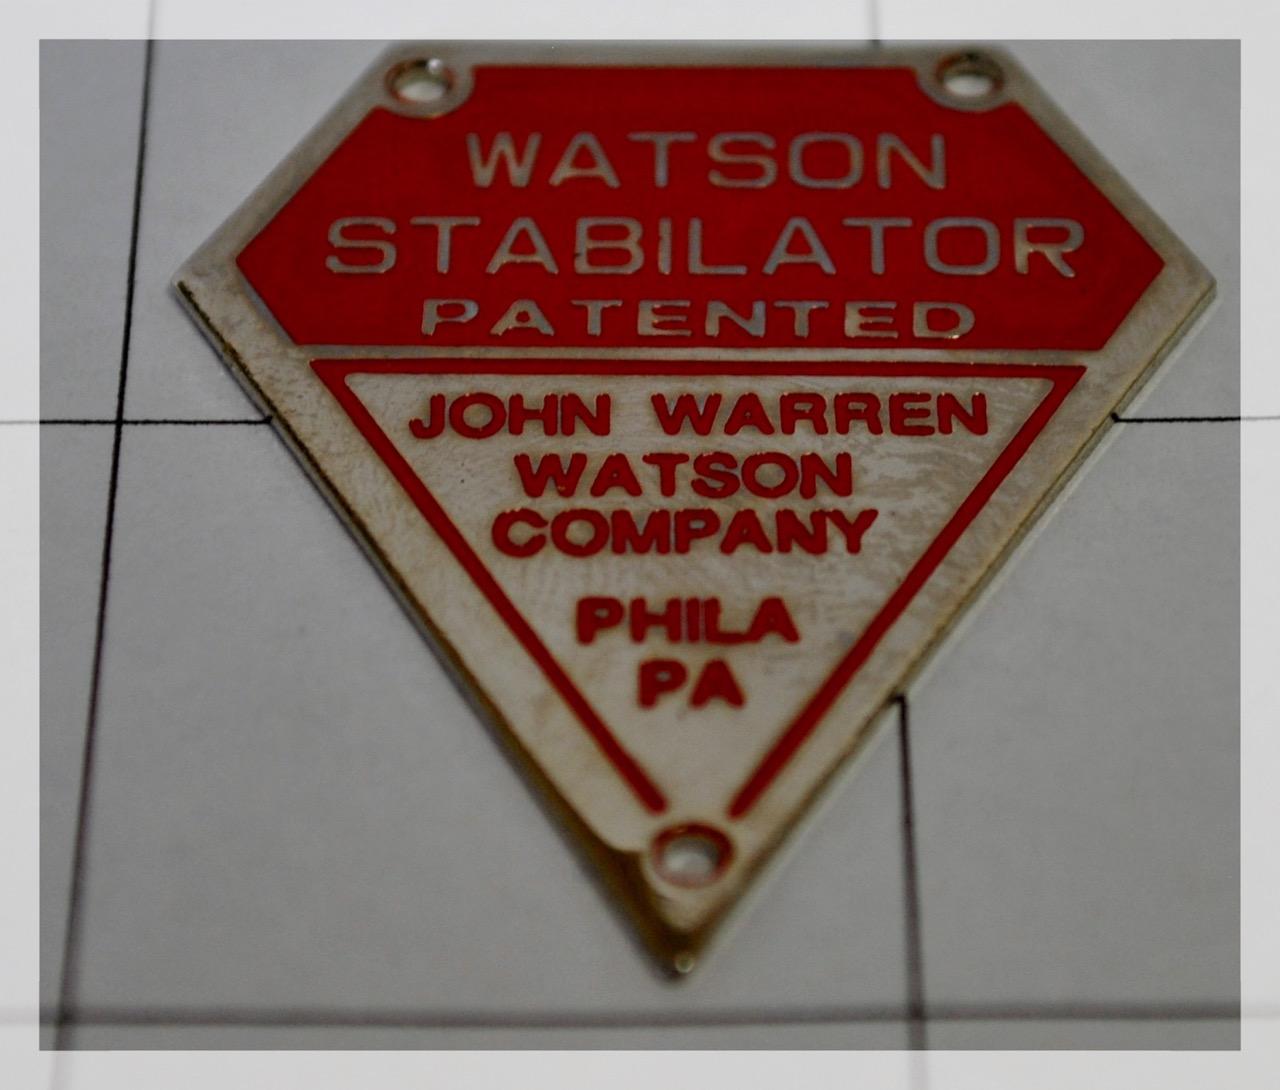 Watson Stabilator